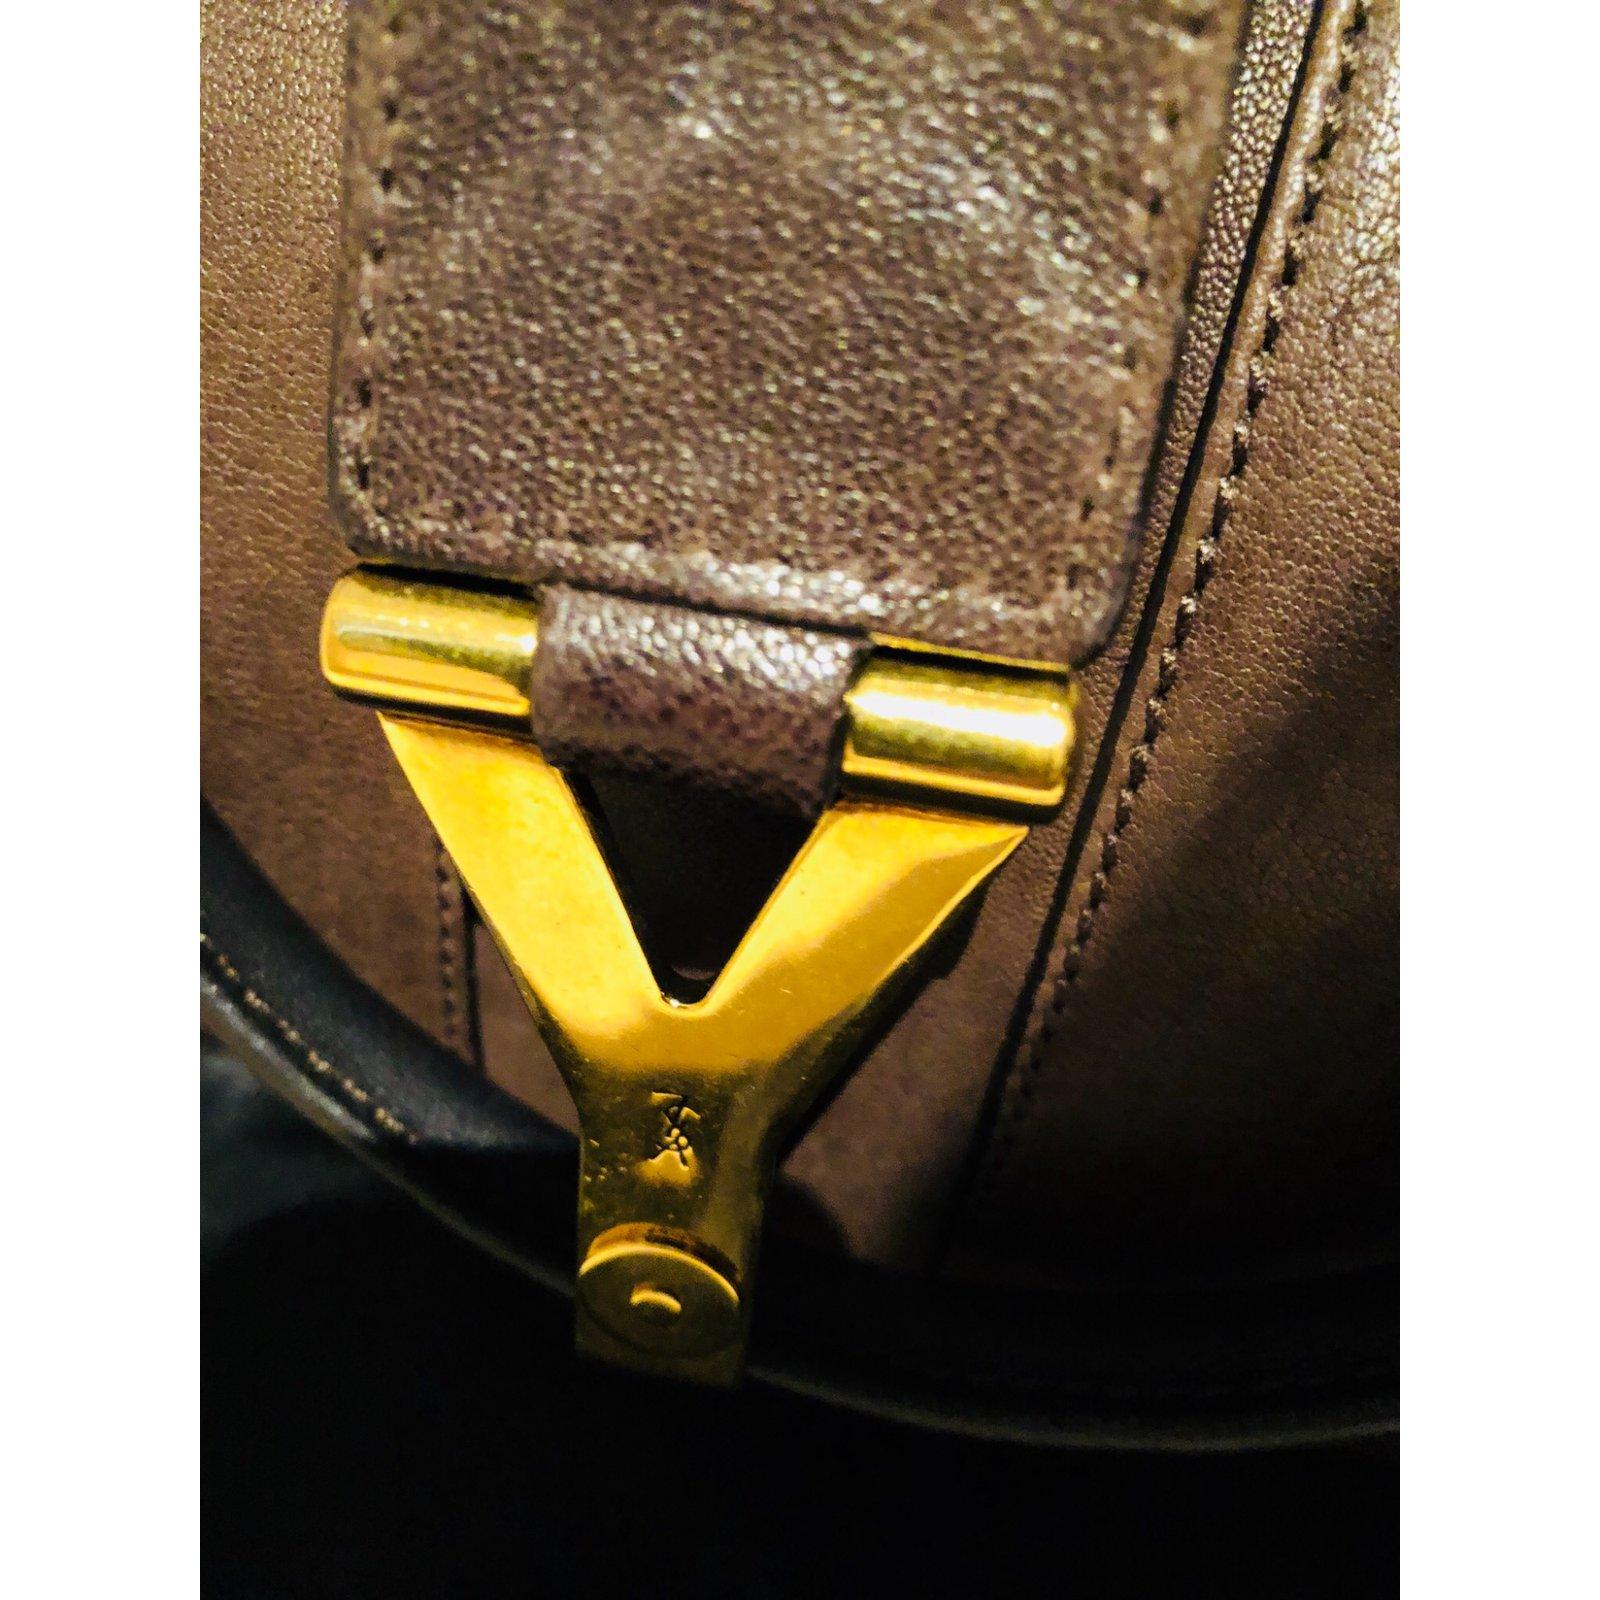 366fbbb4dacd Facebook · Pin This. Yves Saint Laurent CHYC handbag Handbags Leather Dark  brown ...